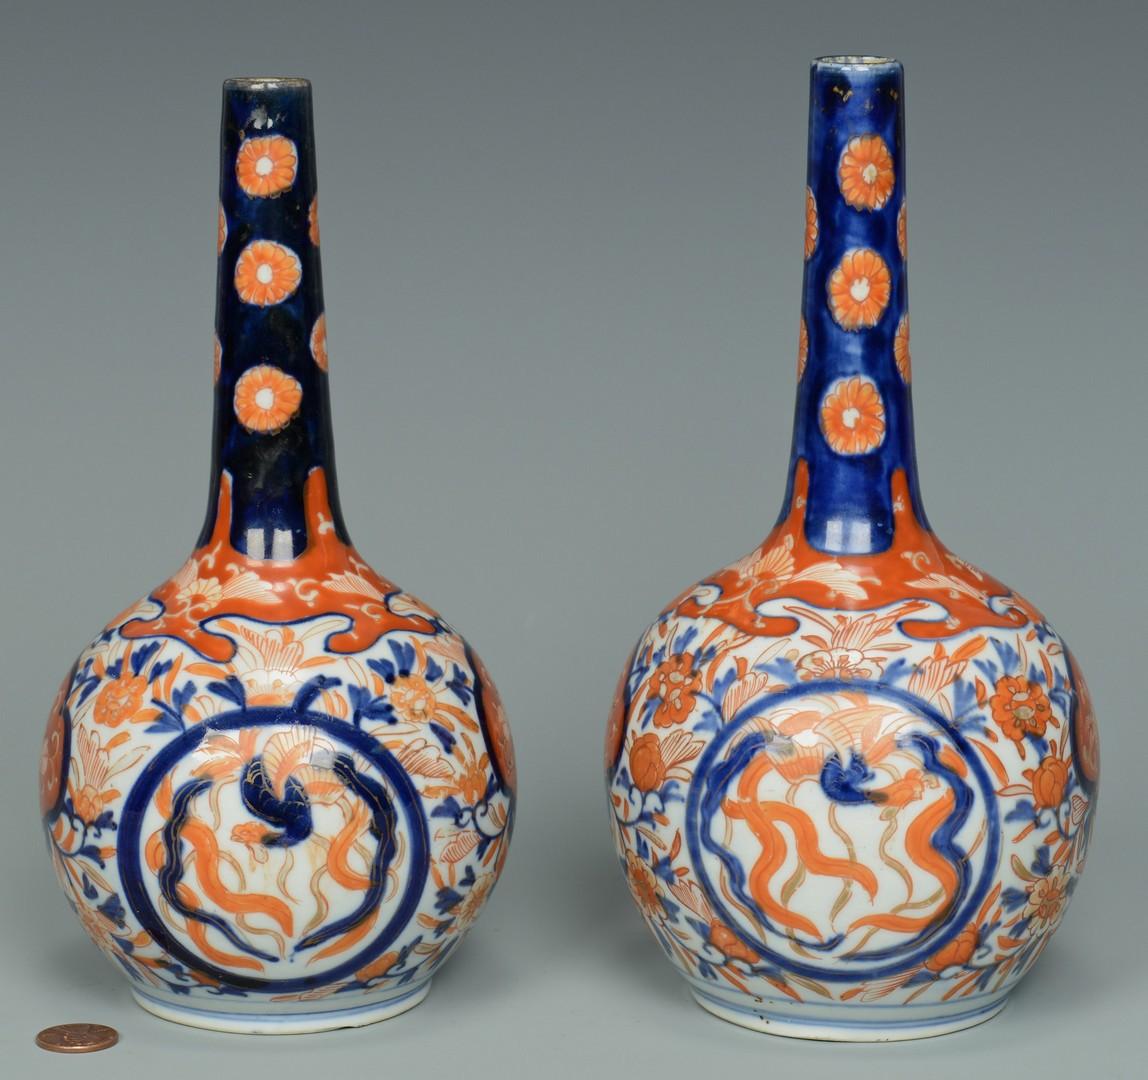 Lot 3383178: Pair Imari Bottles